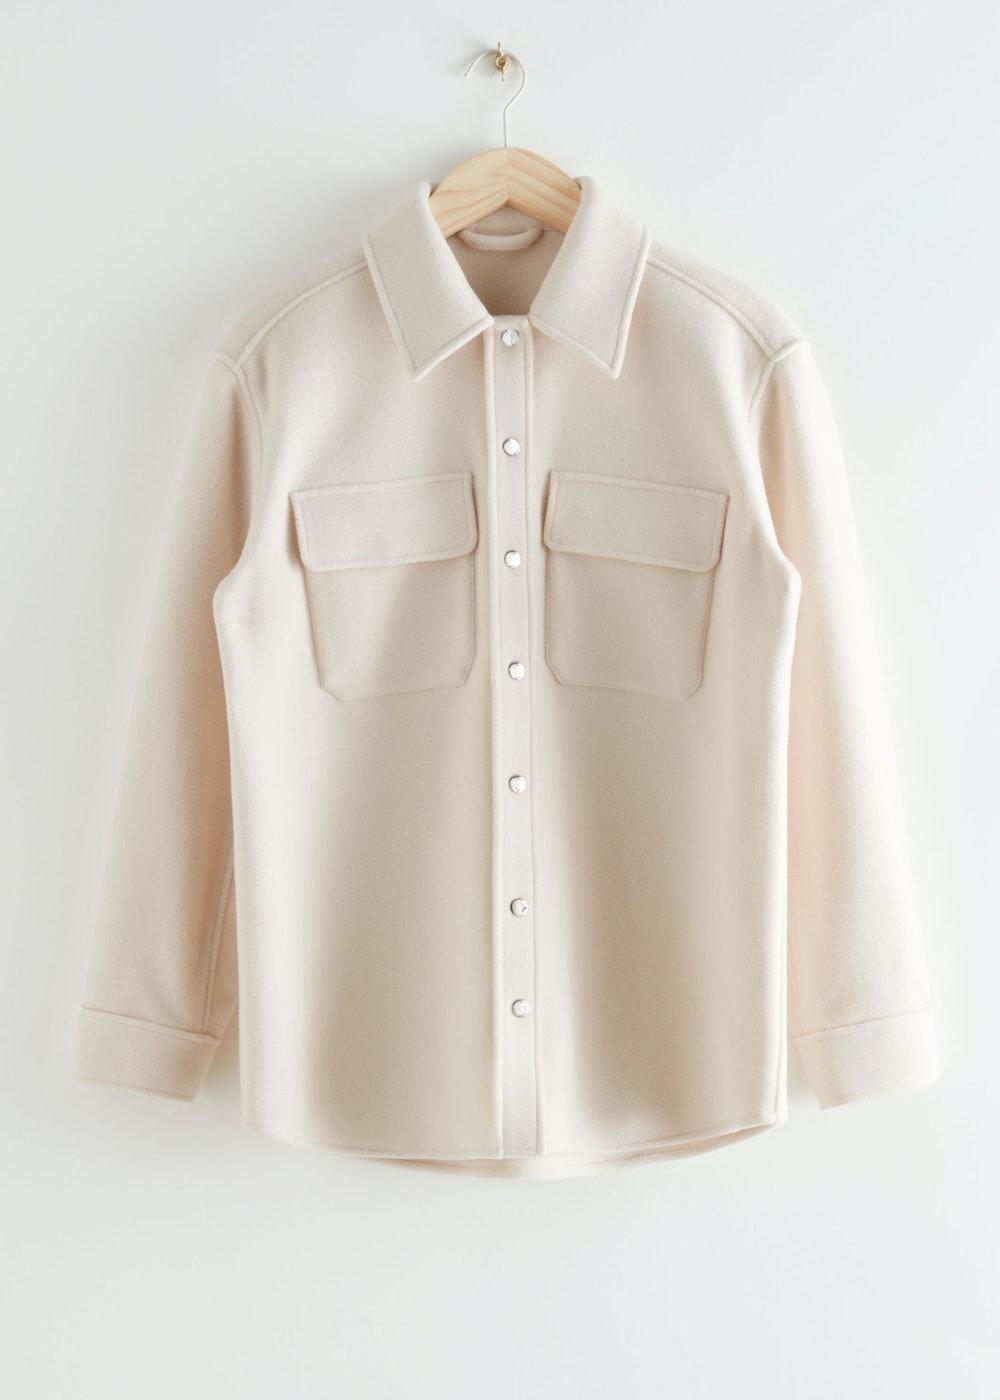 Oversized Wool Blend Workwear Shirt